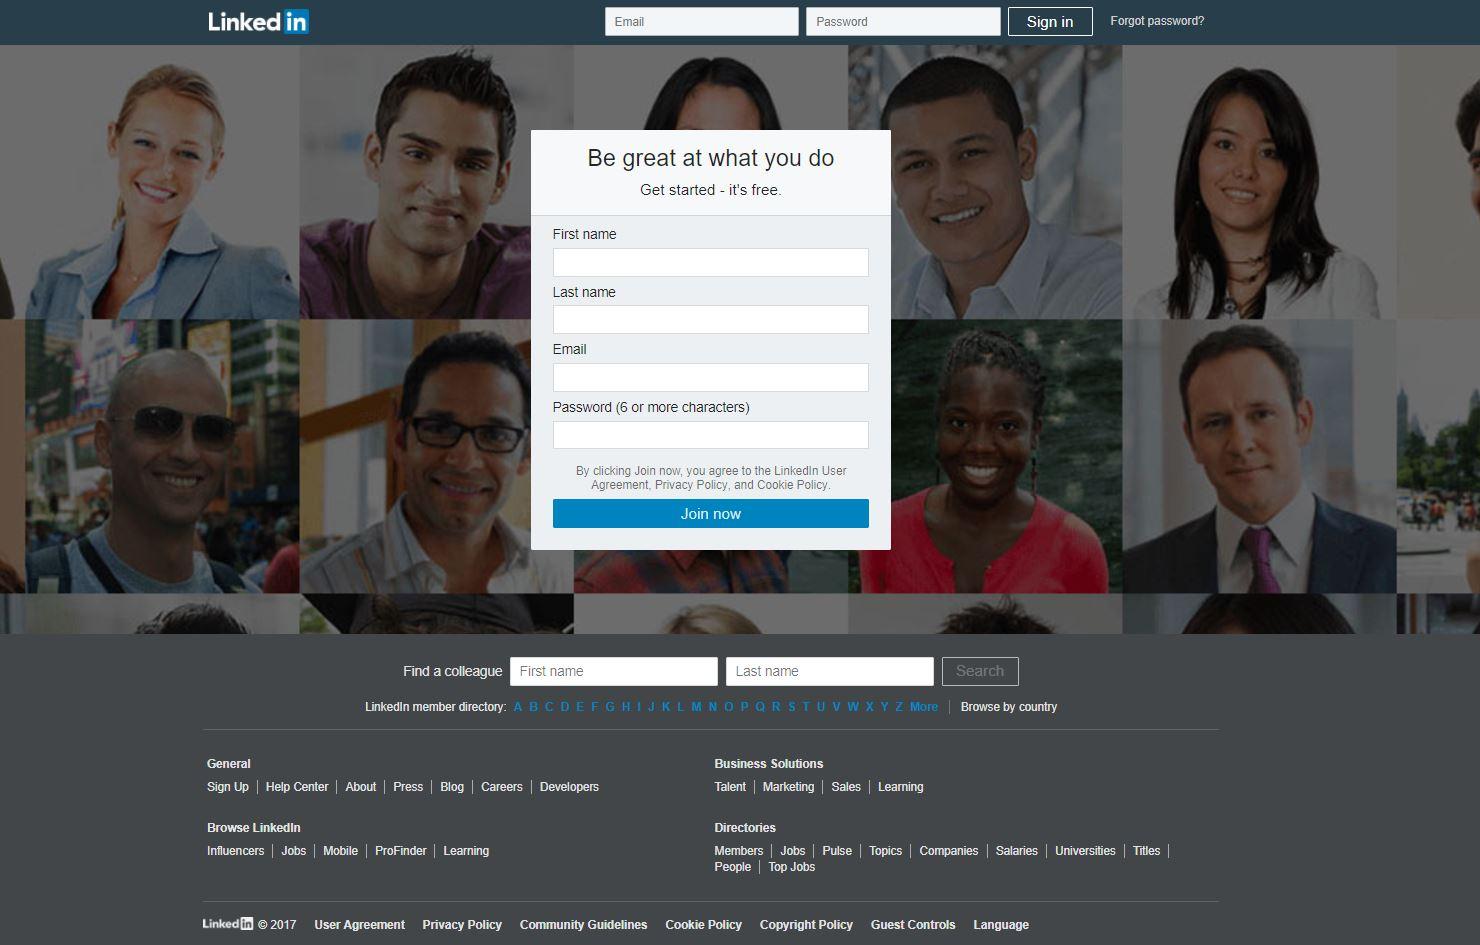 LinkedIn_Login_Page.jpg